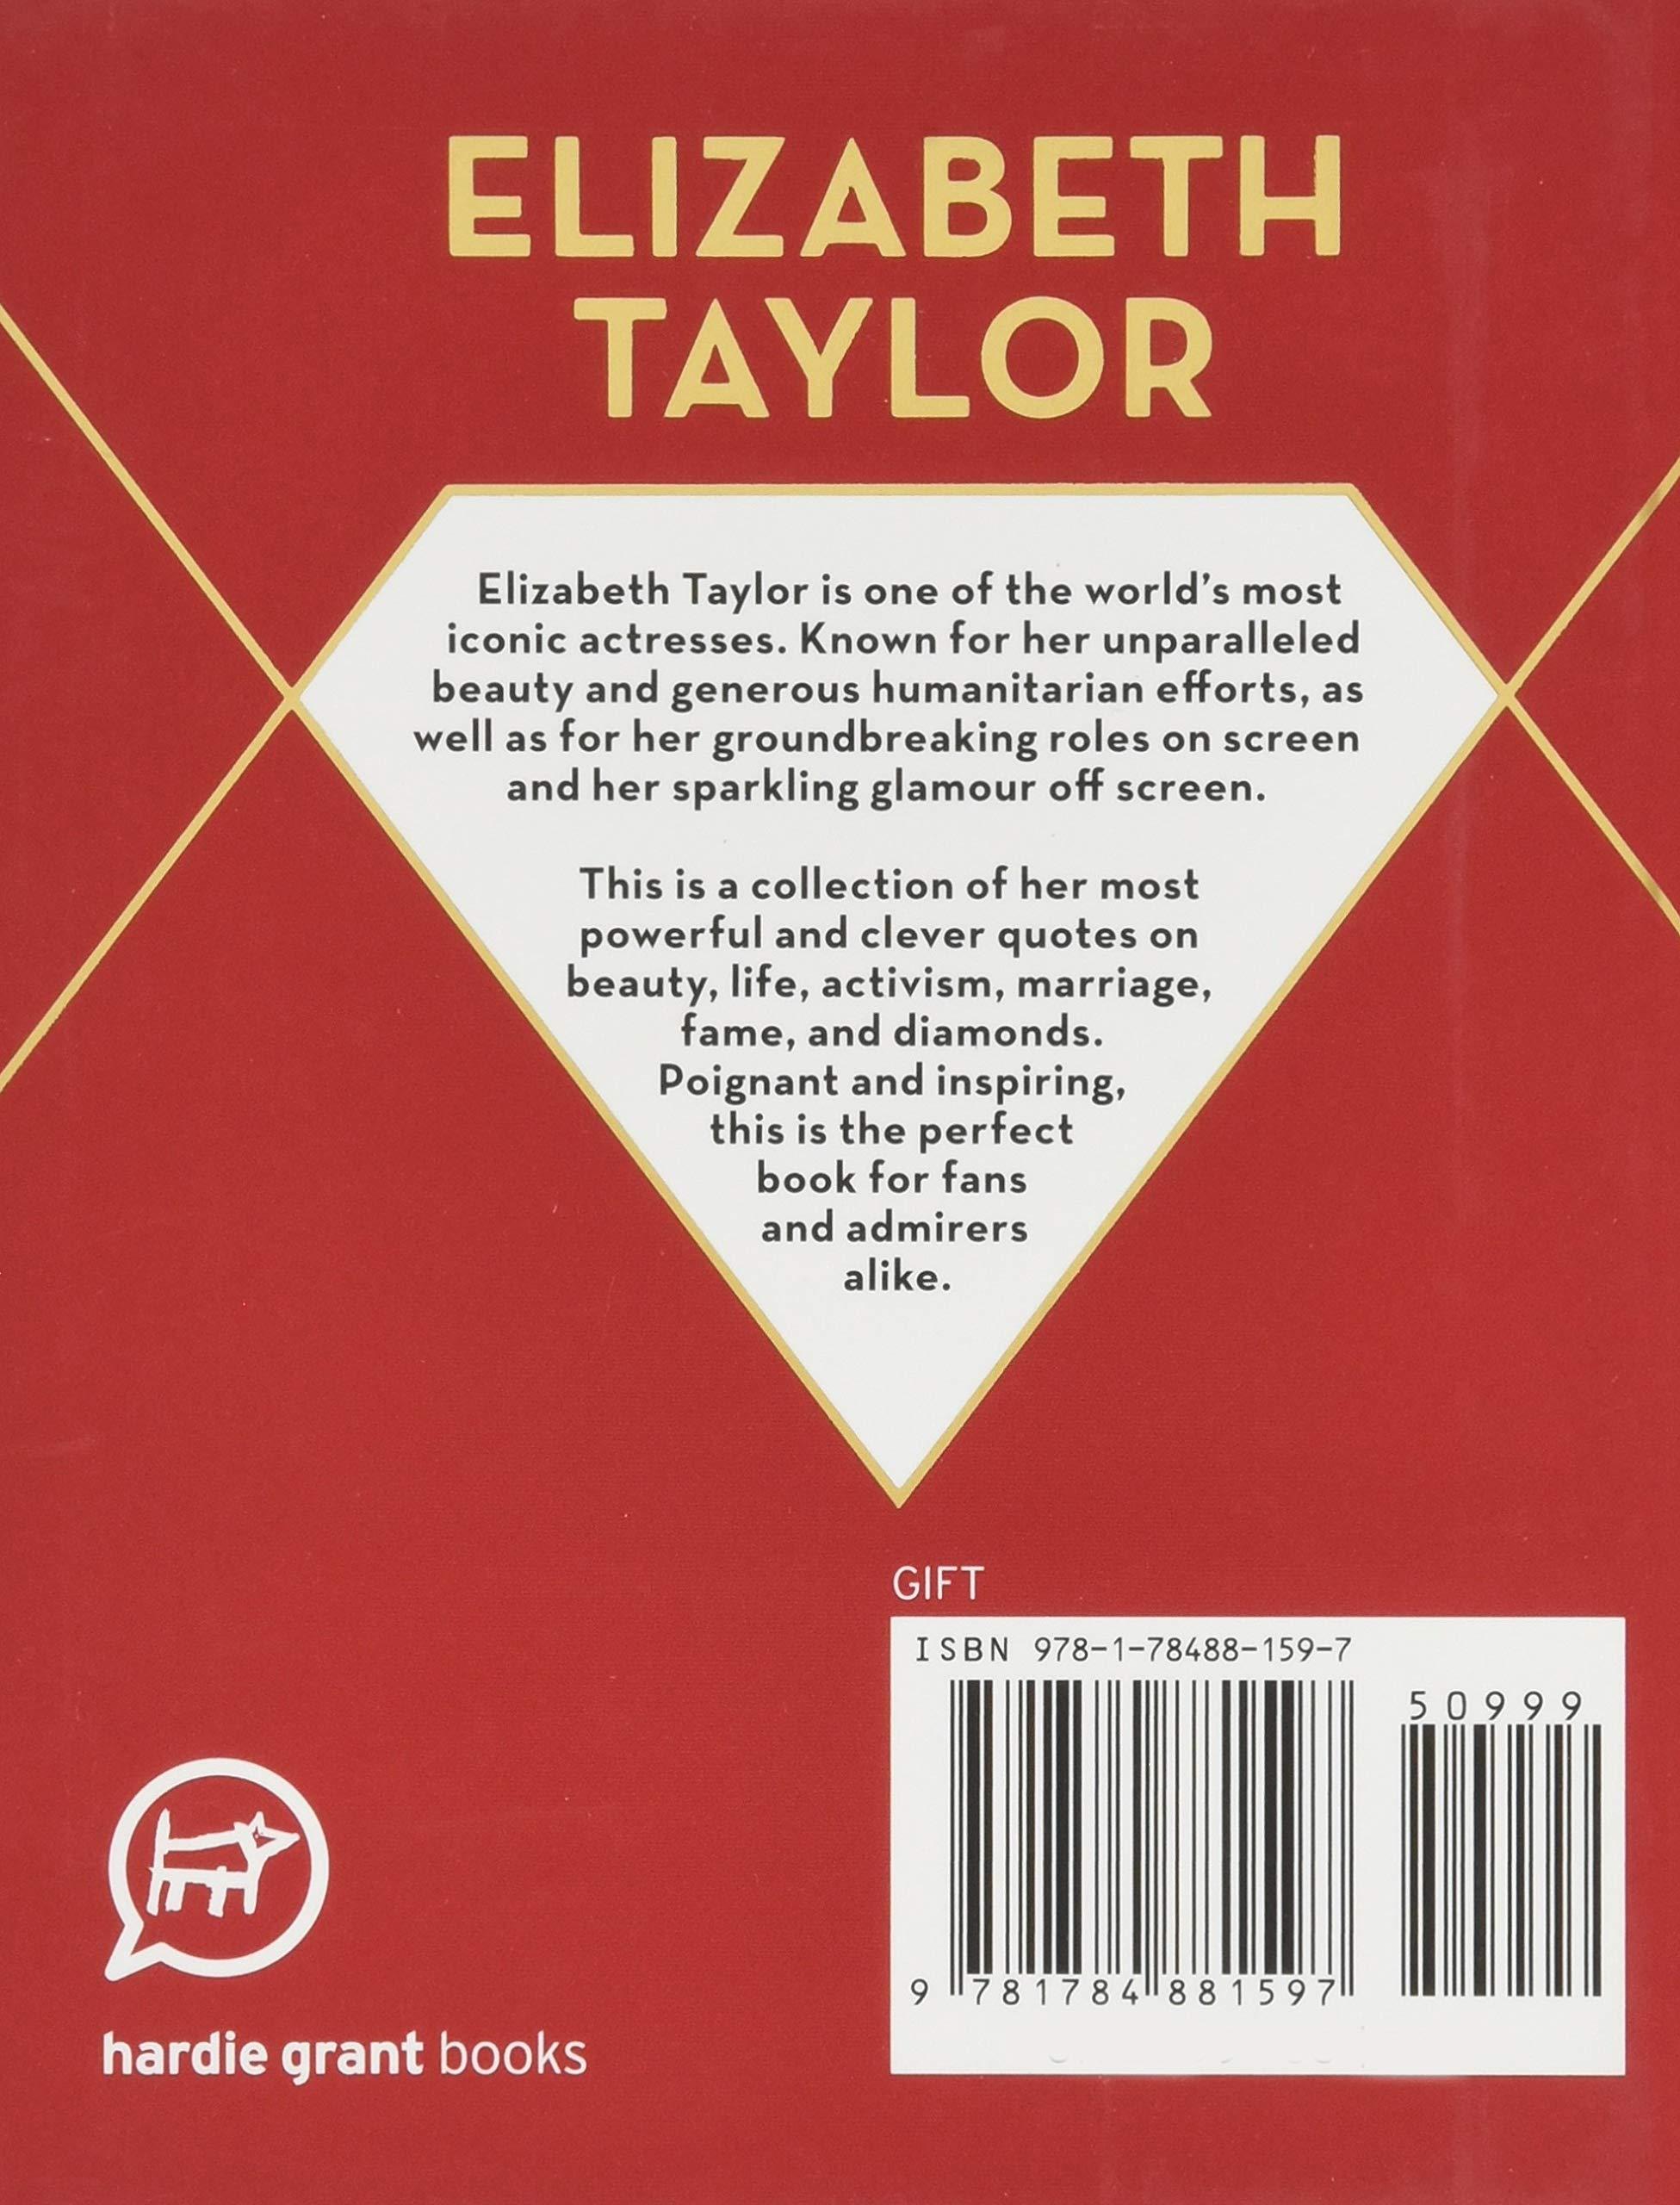 The Giants Fans Little Book of Wisdom (Little Book of Wisdom (Taylor))